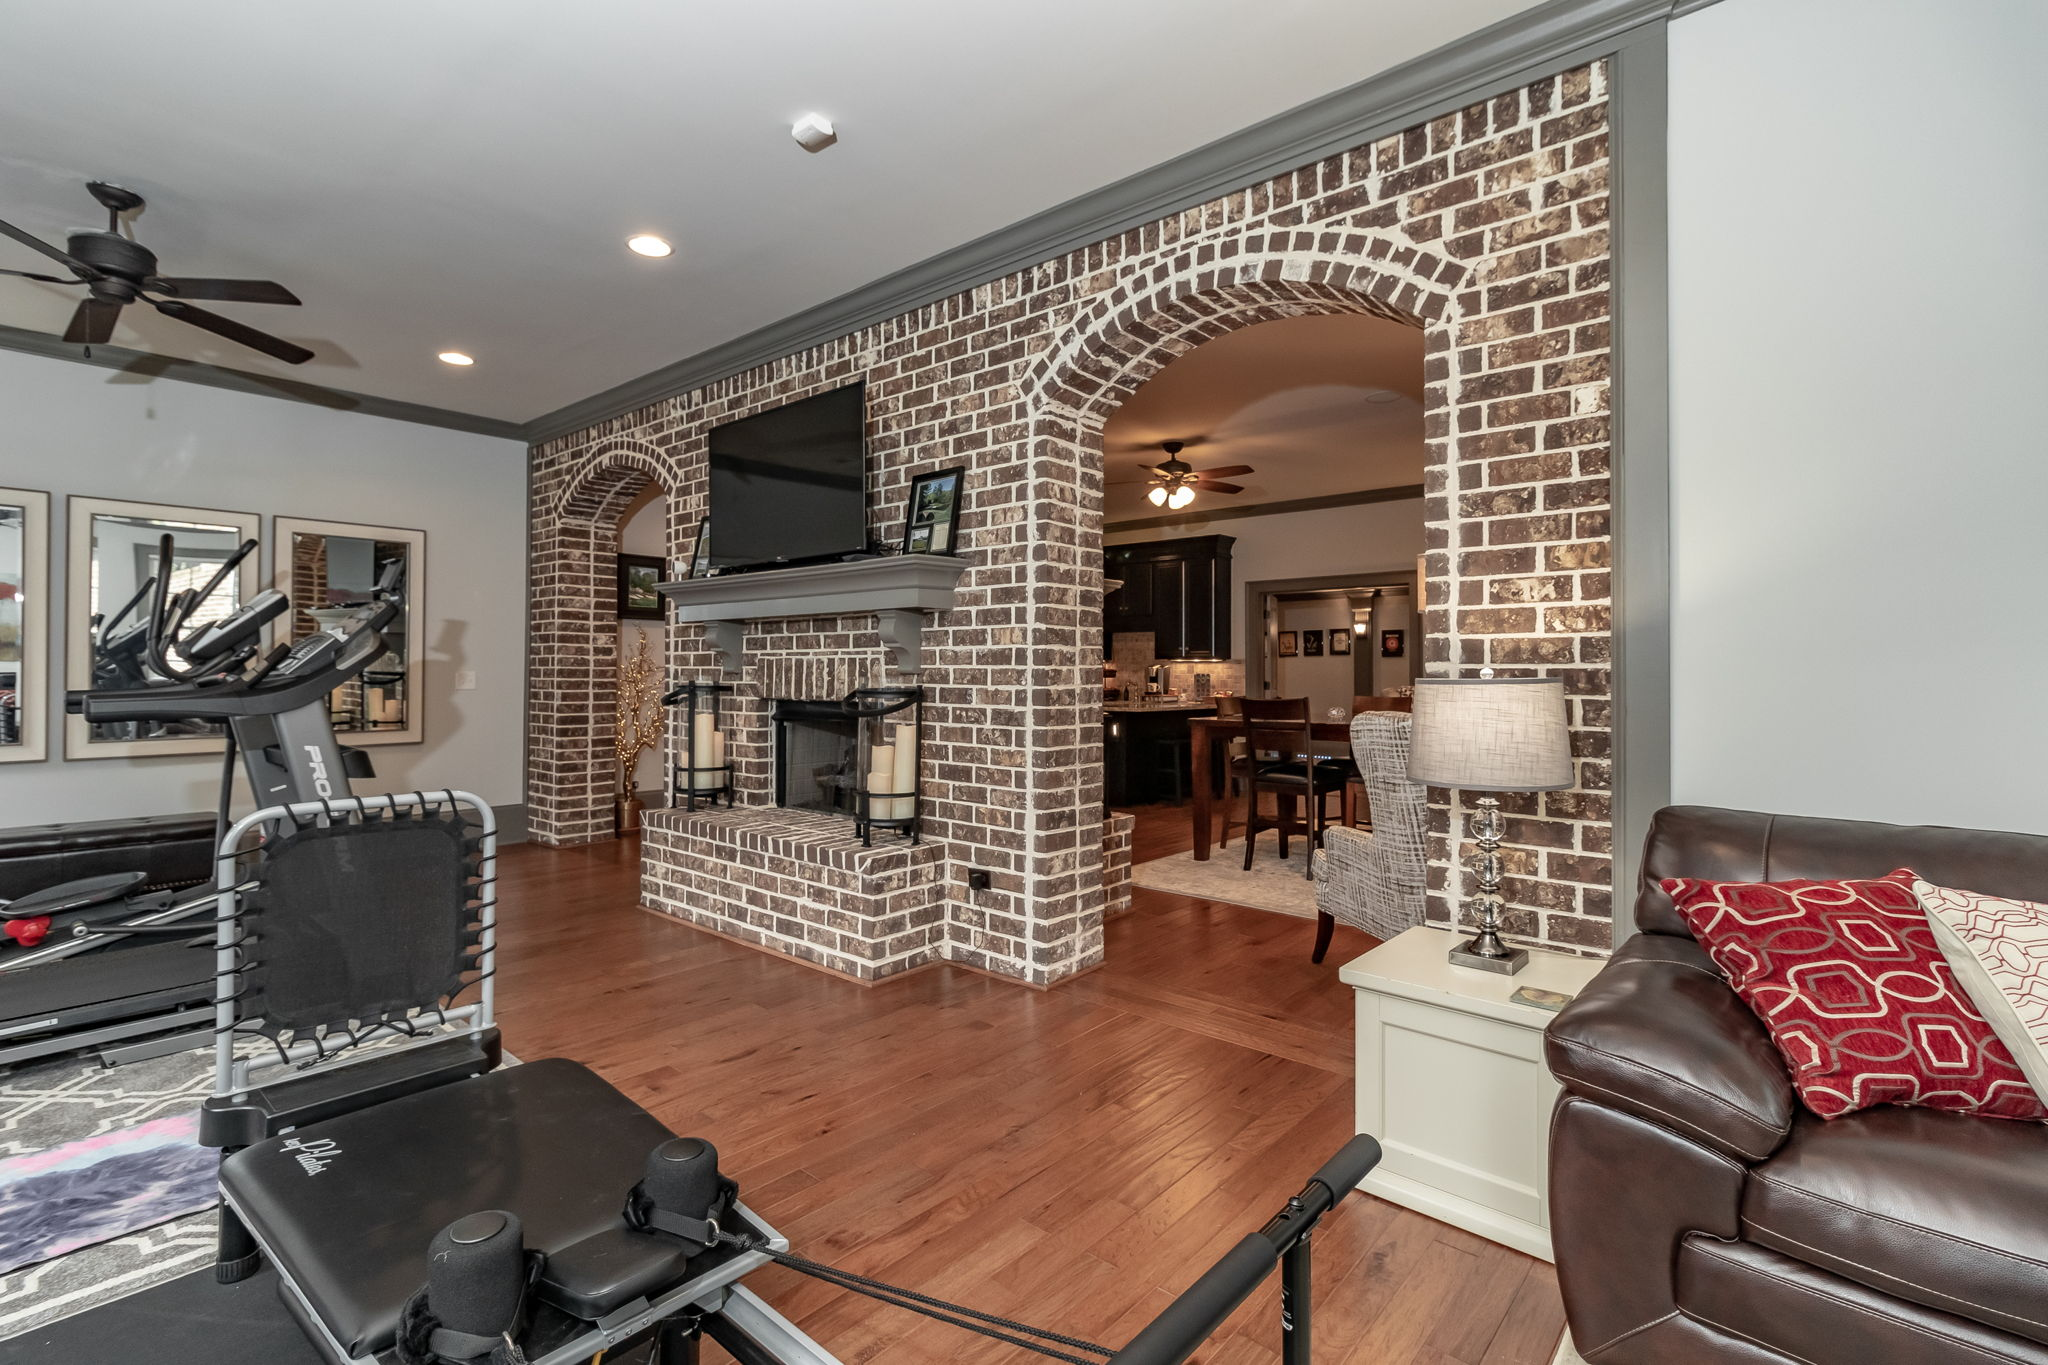 Basement - Recreation Room FirePlace